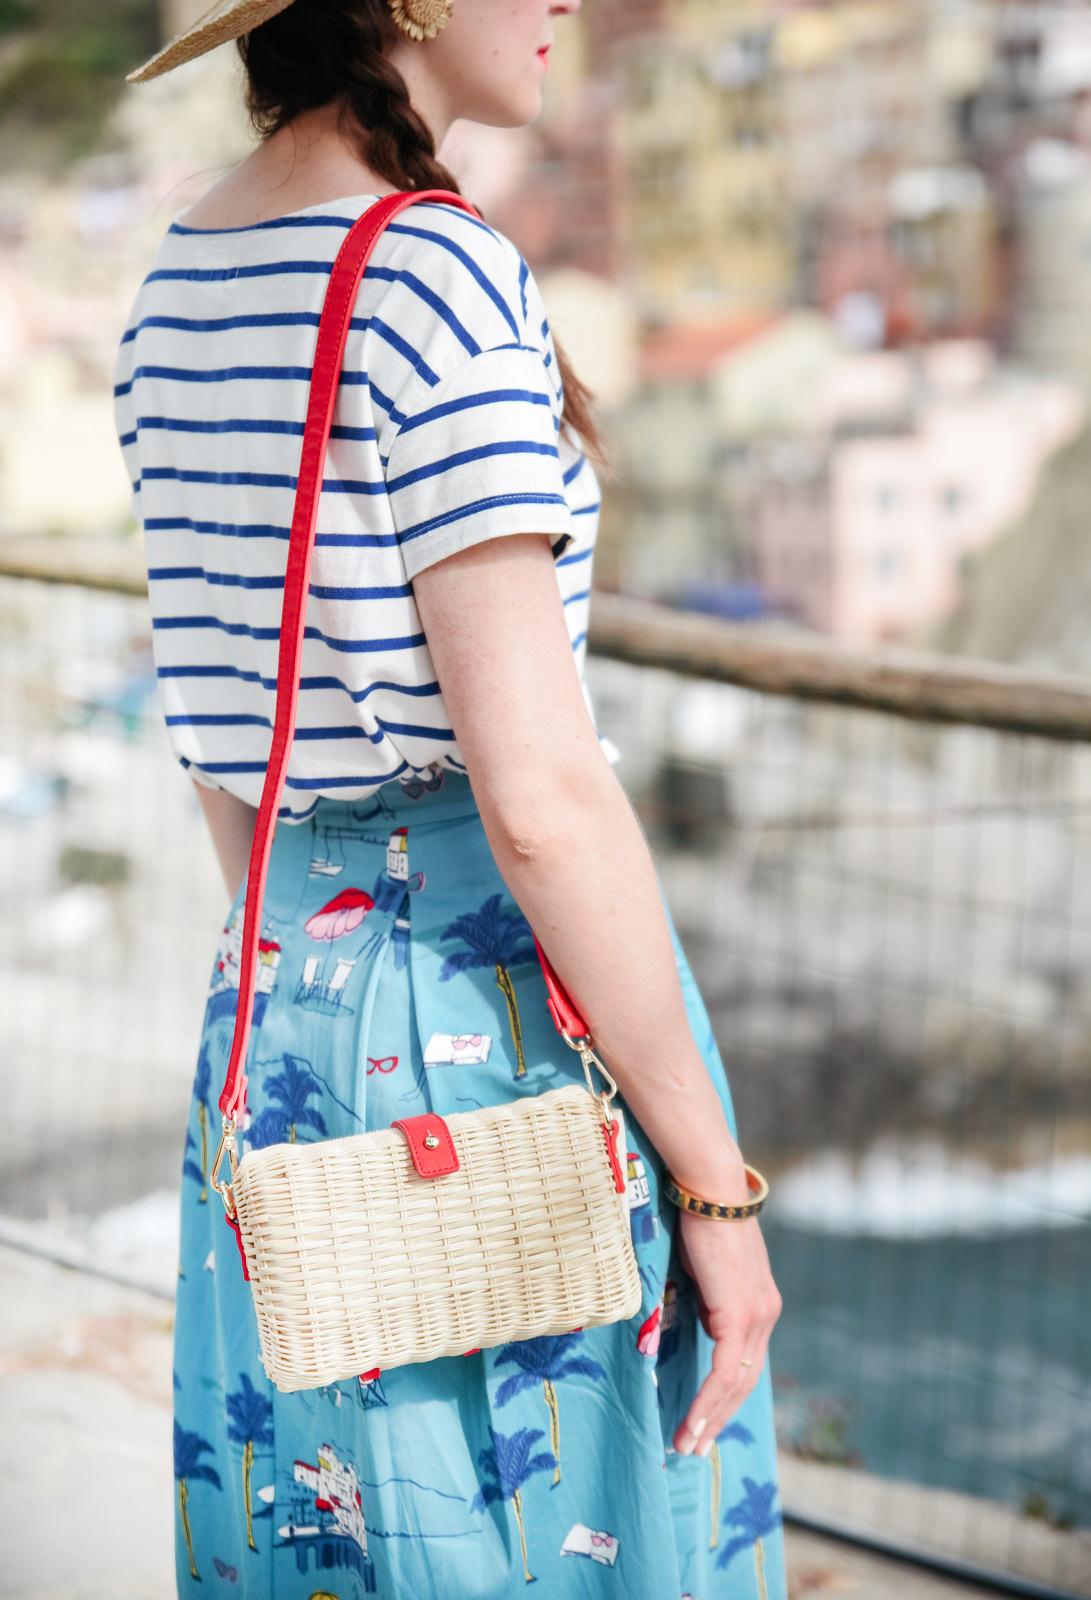 Blog-Mode-And-The-City-Lifestyle-Italie-Sestri-Levante-Cinque-Terre-20